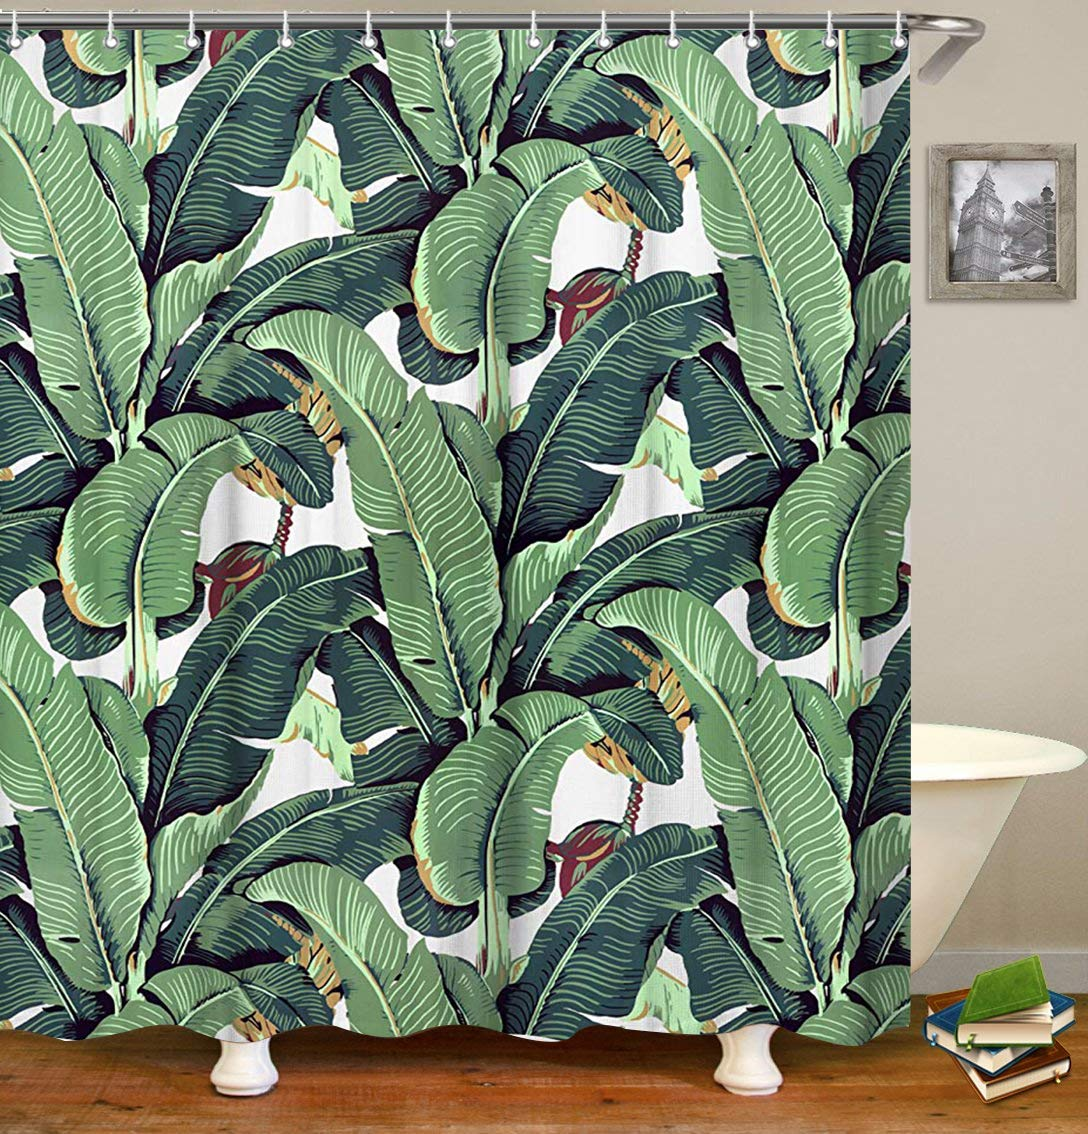 Livilan Tropical Plant Banana Leaf Shower Curtain Set 72'' x 72'' Decorative Mildew Resistant Waterproof Polyester Fabric Bathroom Curtain, Green